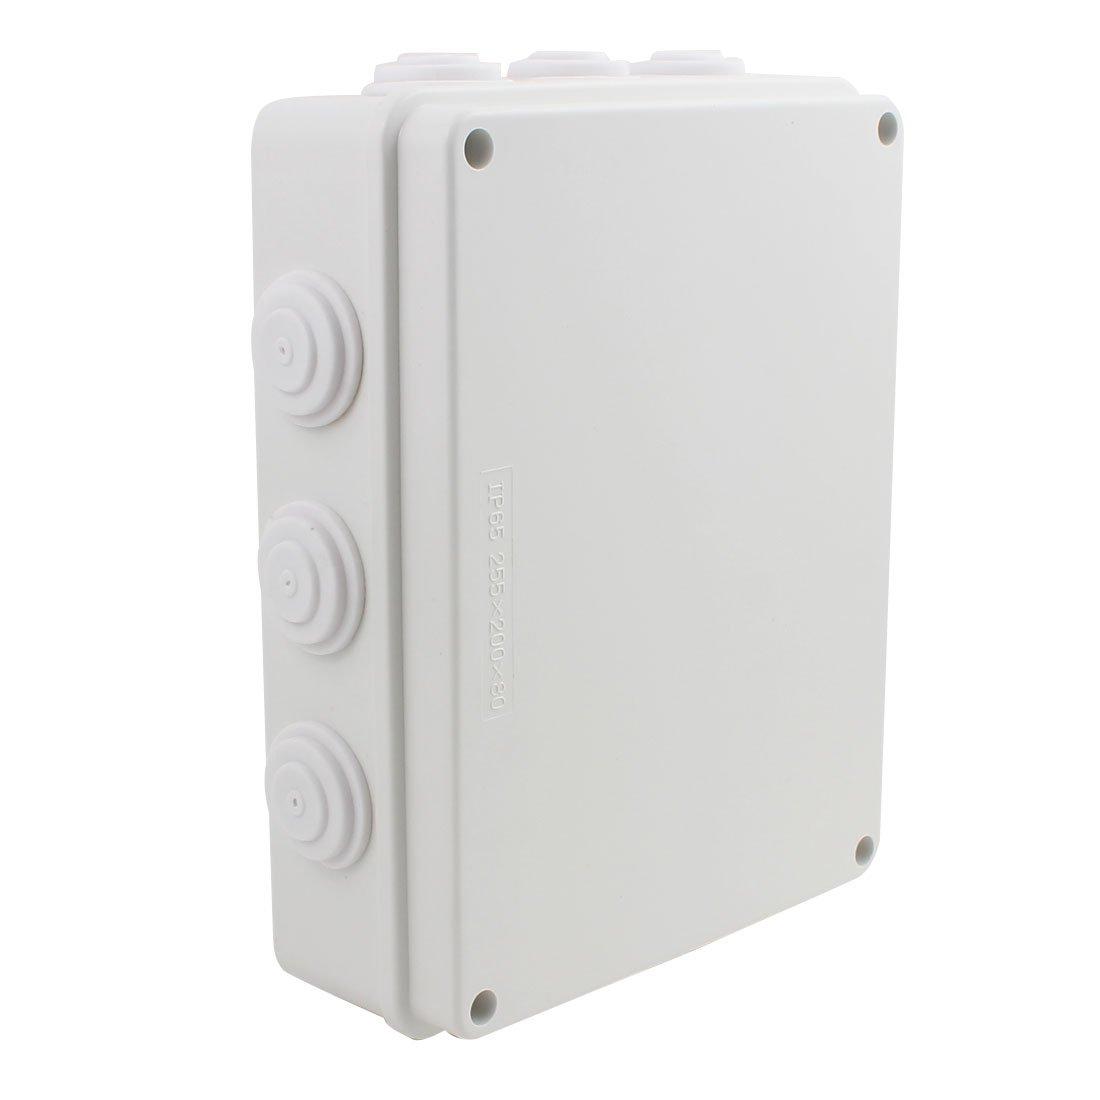 D74mm x H45mm Dustproof IP44 Junction Box Universal Electric Project Enclosure